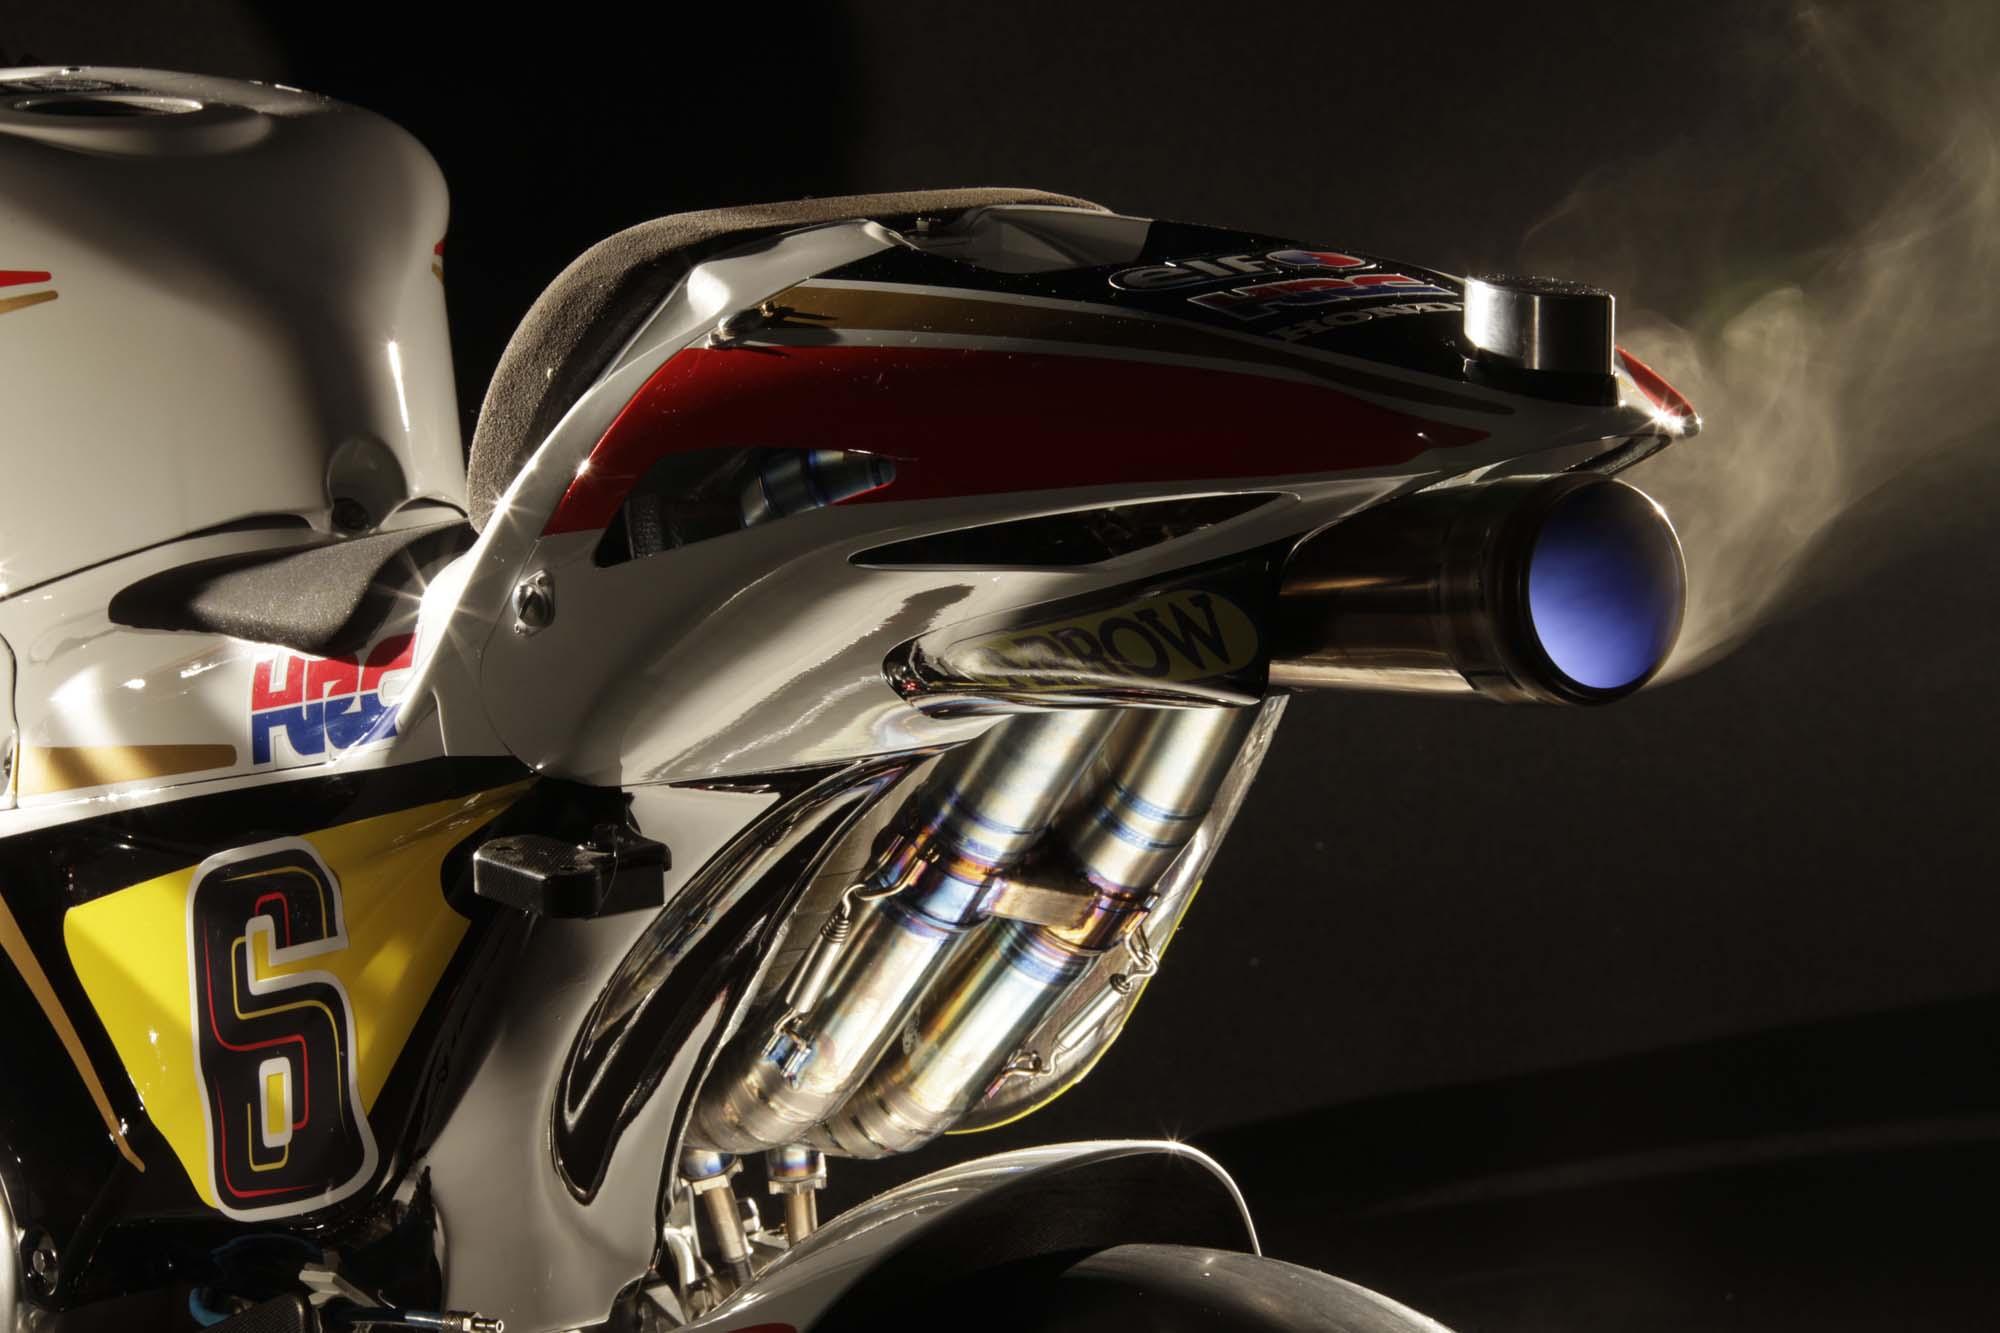 LCR Honda MotoGP RC213V